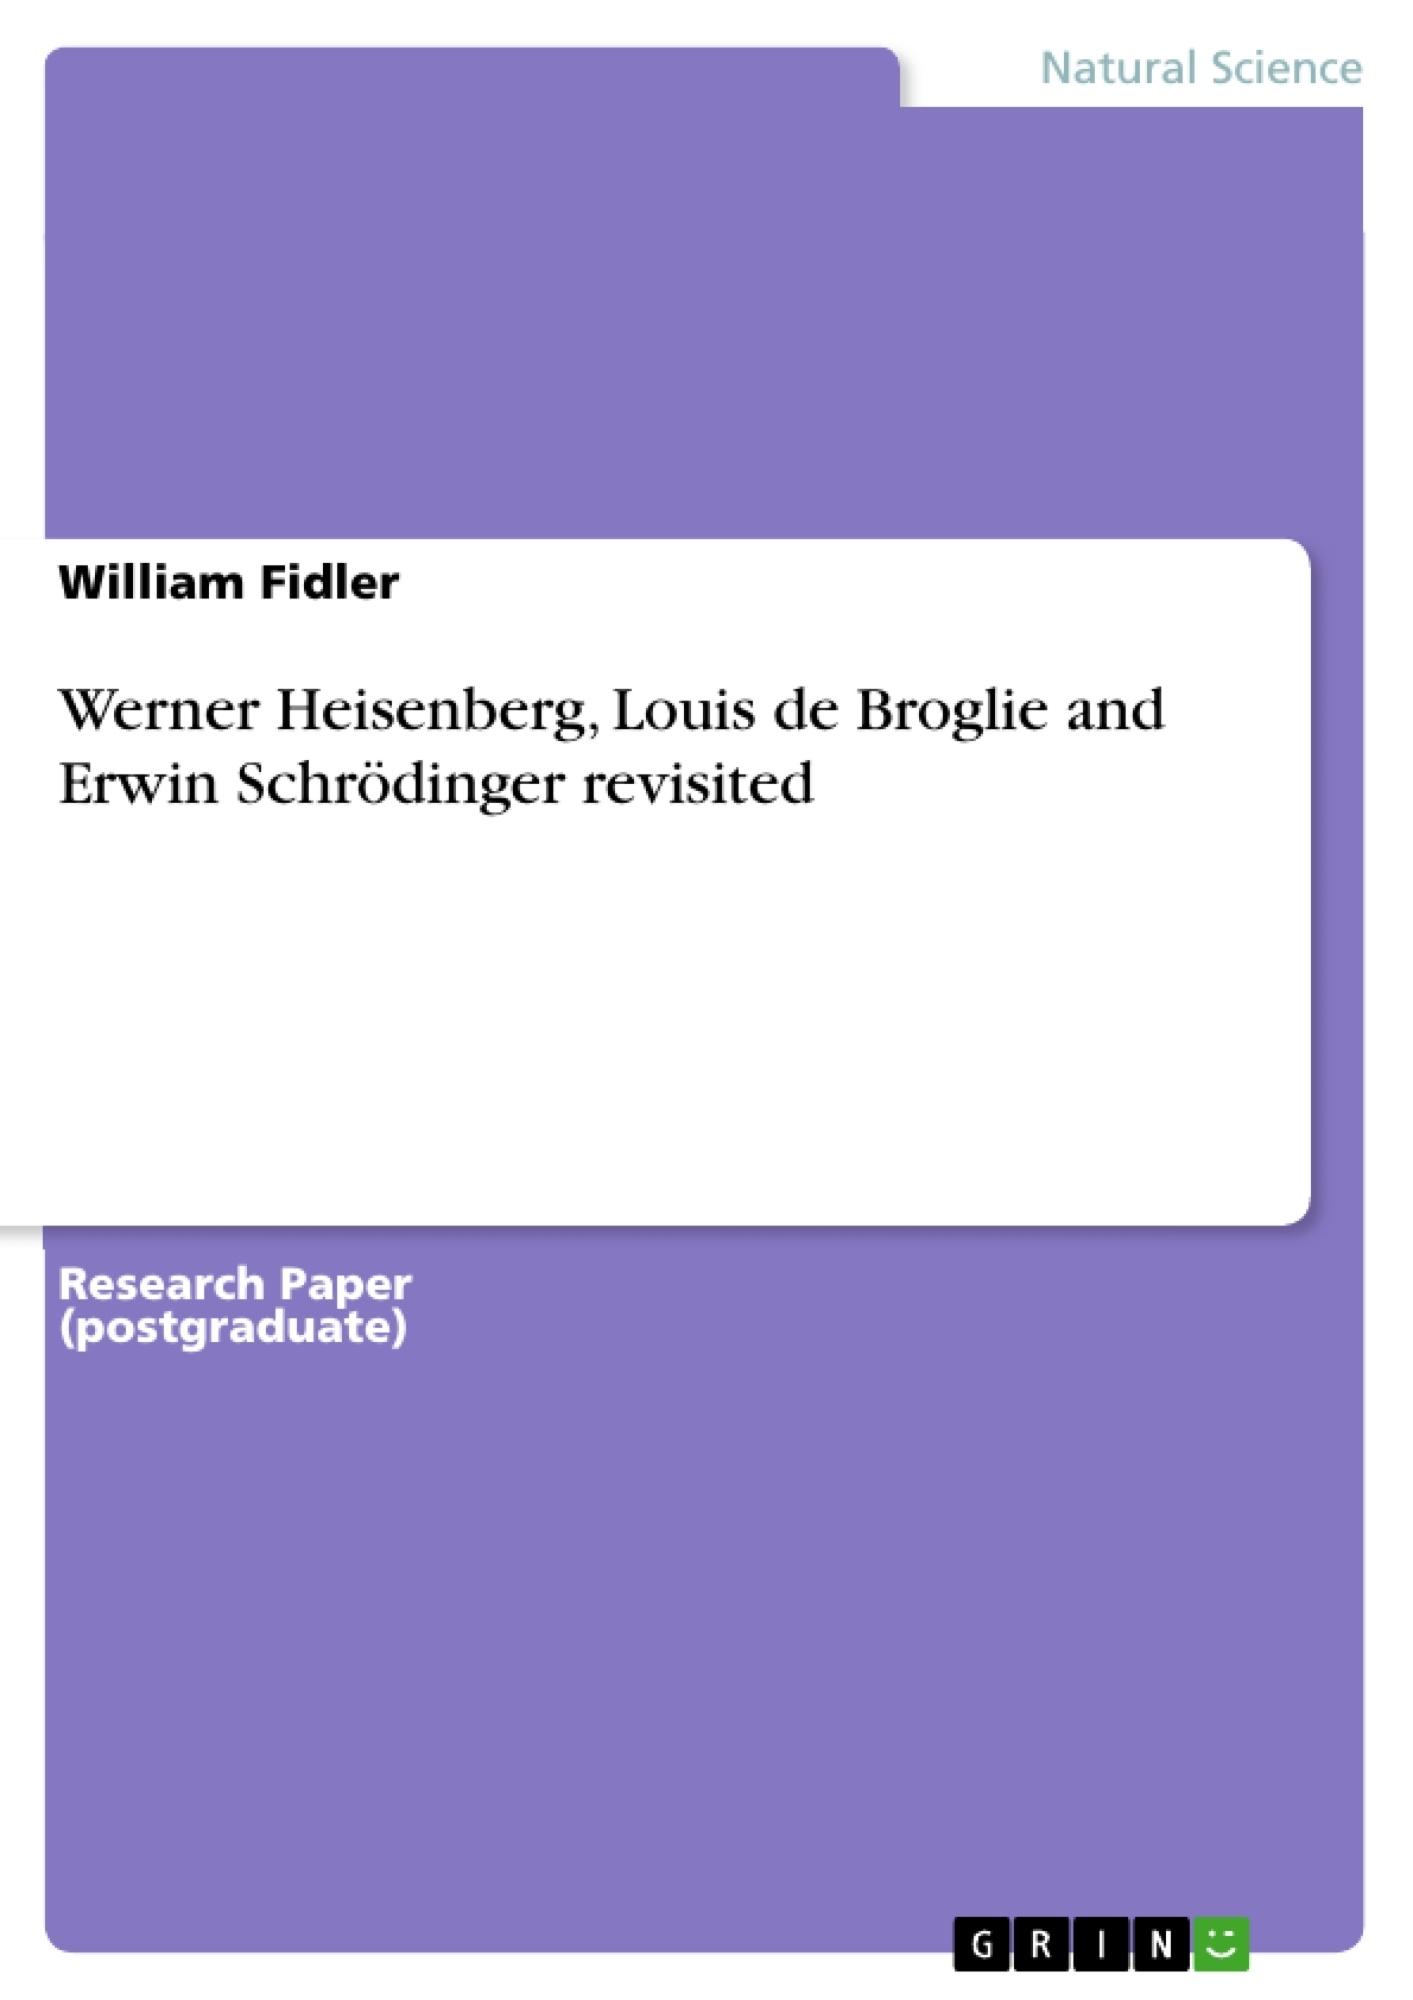 Title: Werner Heisenberg, Louis de Broglie and Erwin Schrödinger revisited